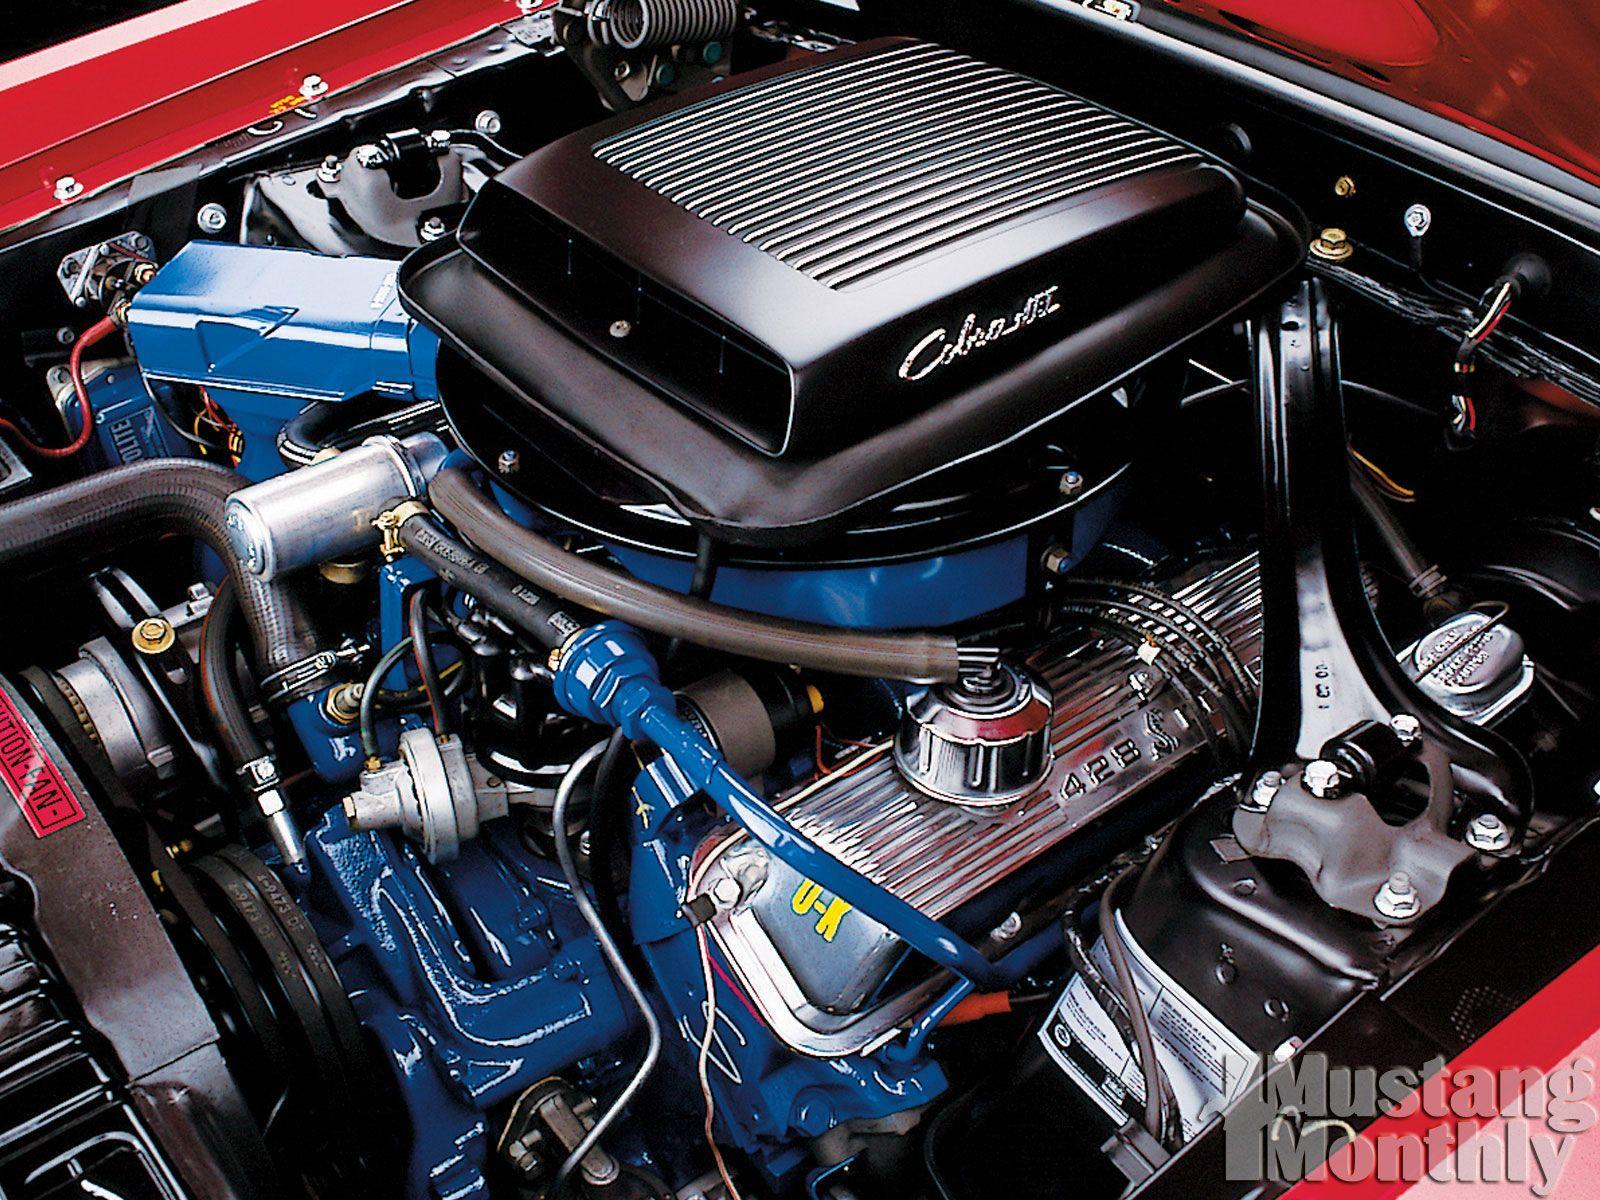 428 cobra jet engine and 427 ford engine - Ford Mustang Cobra Jet Engine